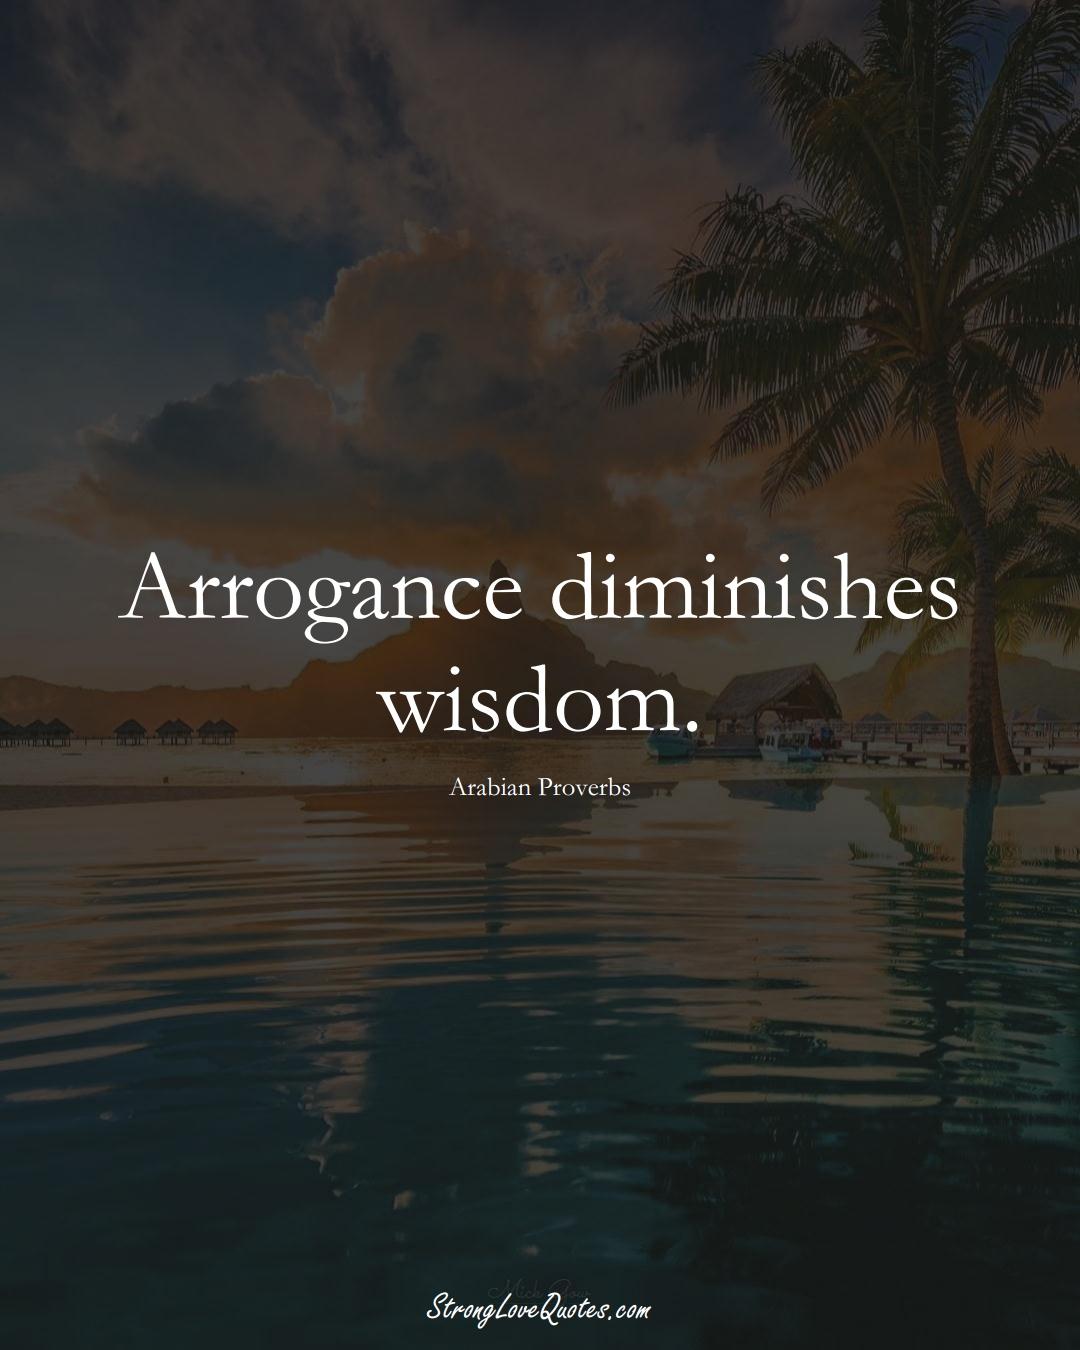 Arrogance diminishes wisdom. (Arabian Sayings);  #aVarietyofCulturesSayings